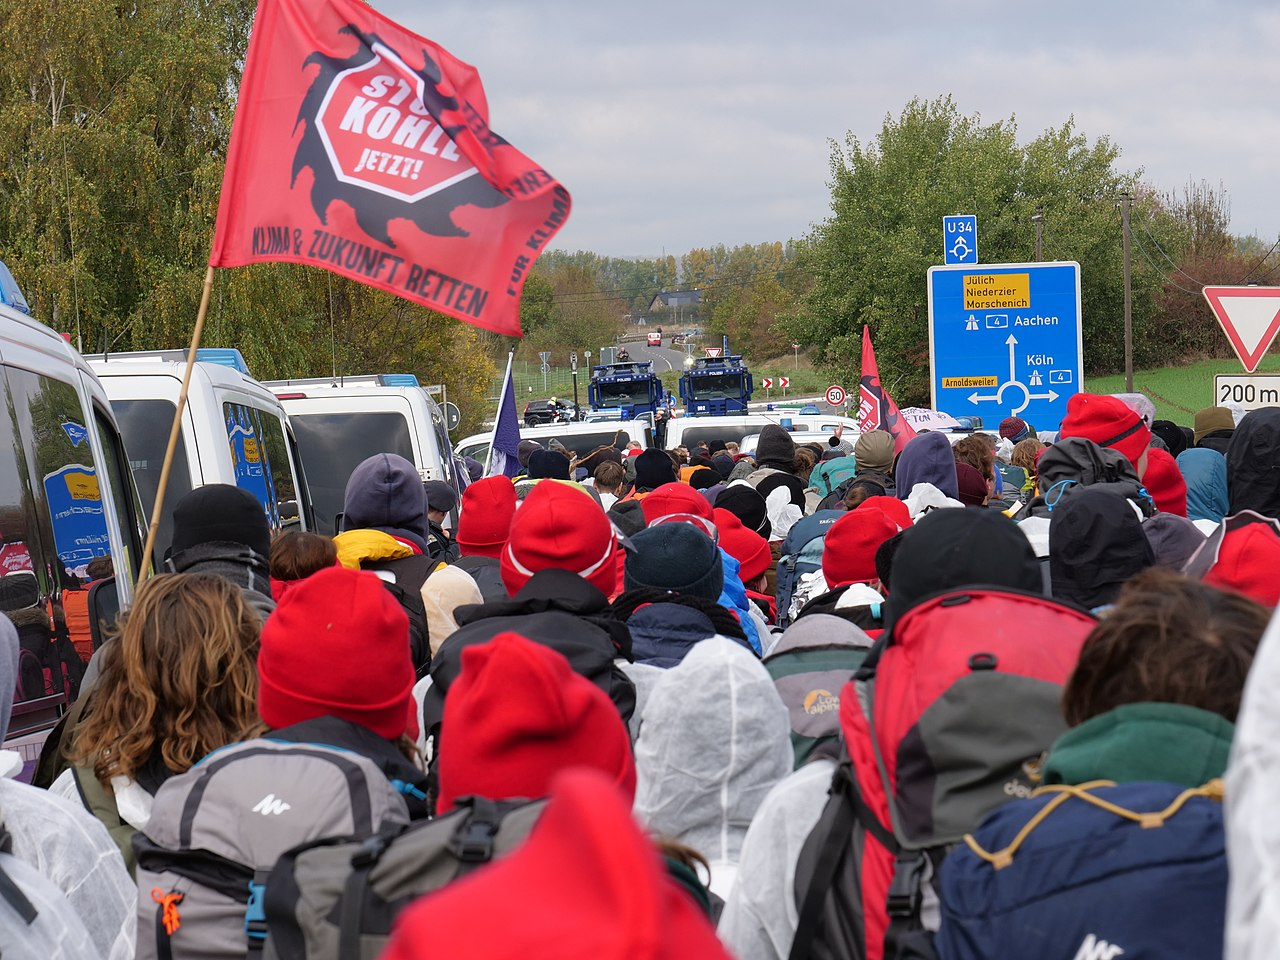 Ende Gelände Demonstration 27-10-2018 30.jpg